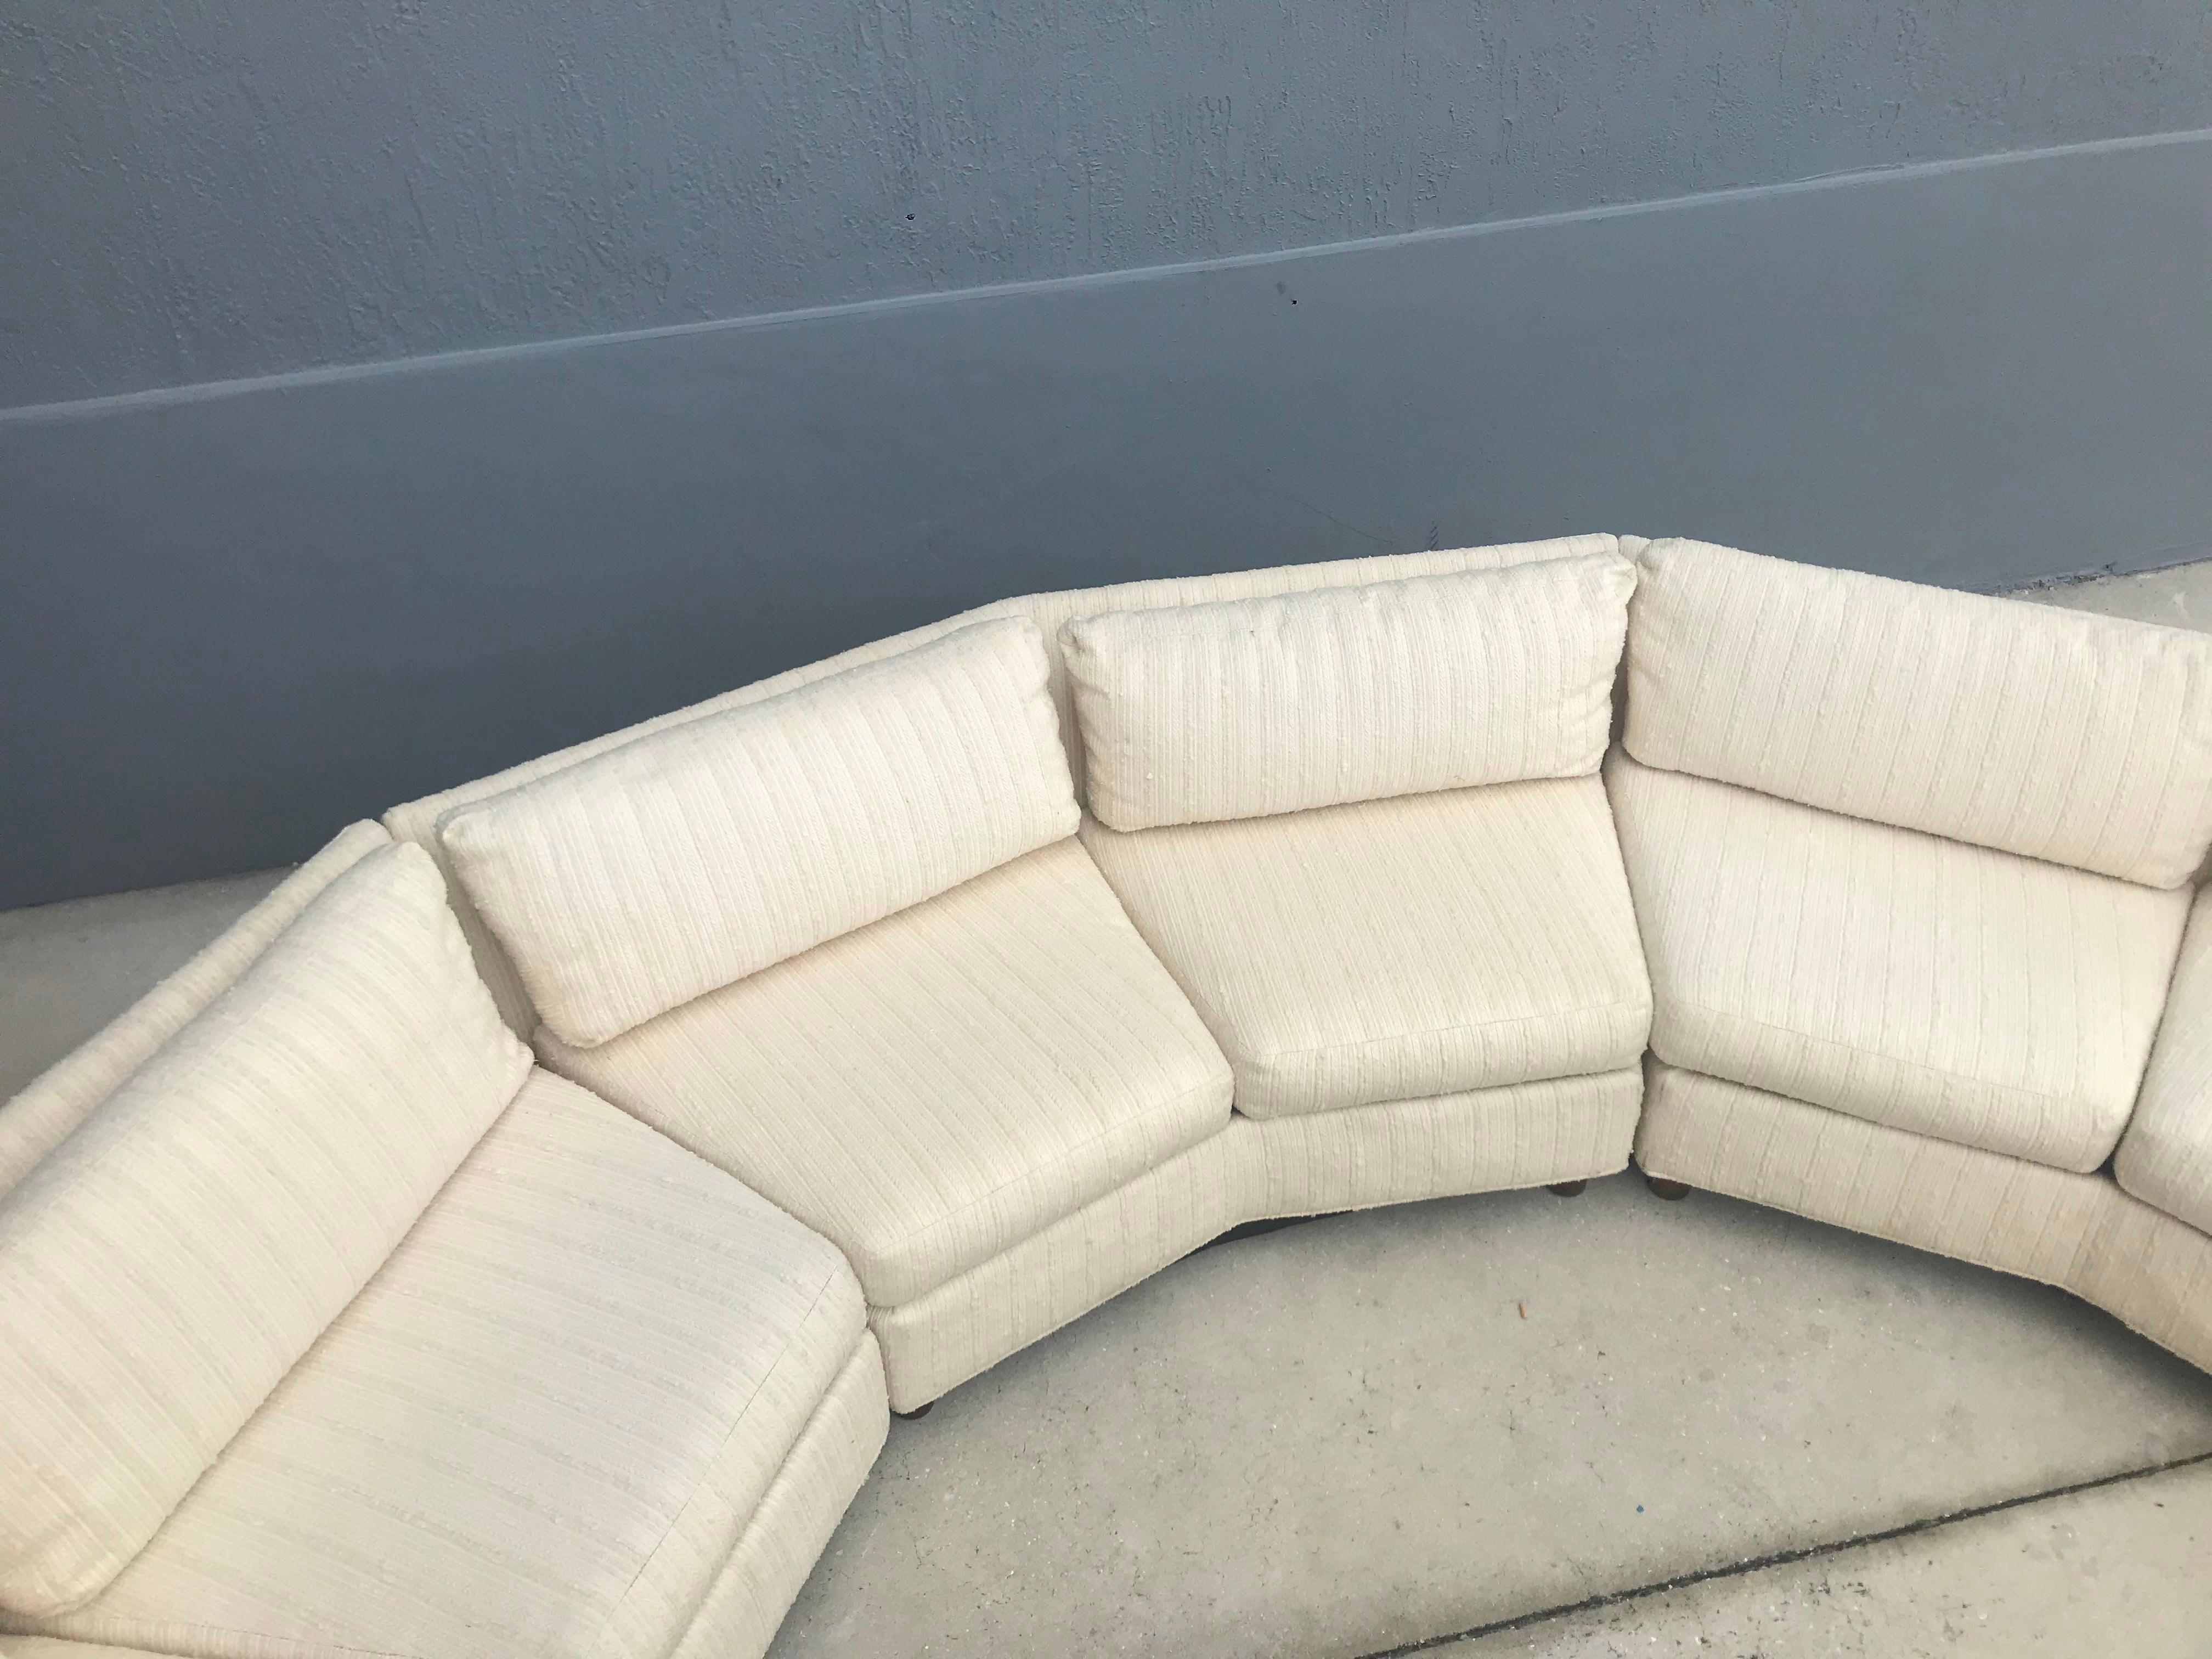 selig mid century modern semi circle sectional sofa